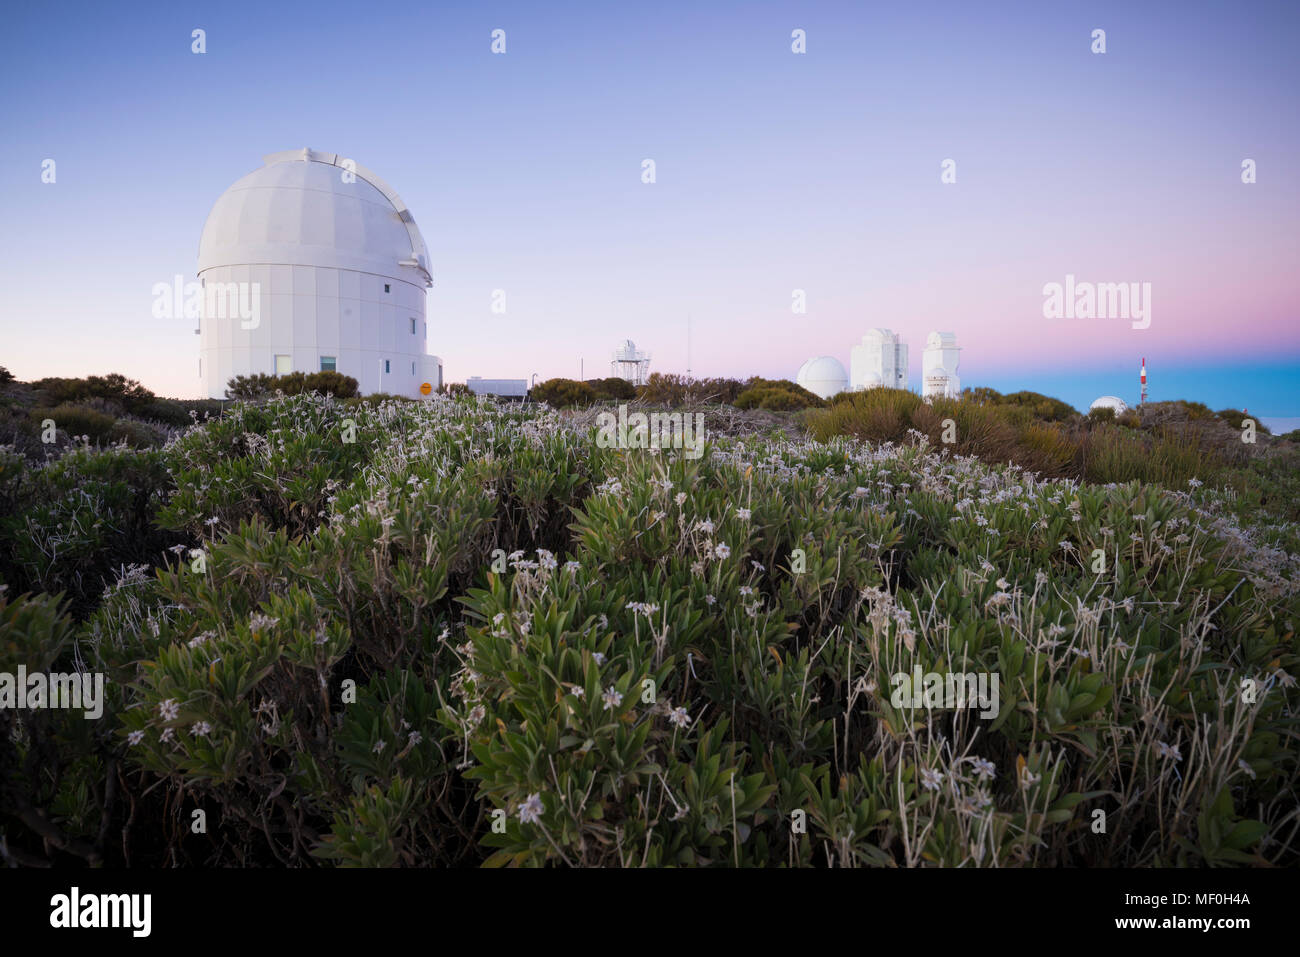 Spain, Canary Islands, Tenerife, Teide observatory - Stock Image